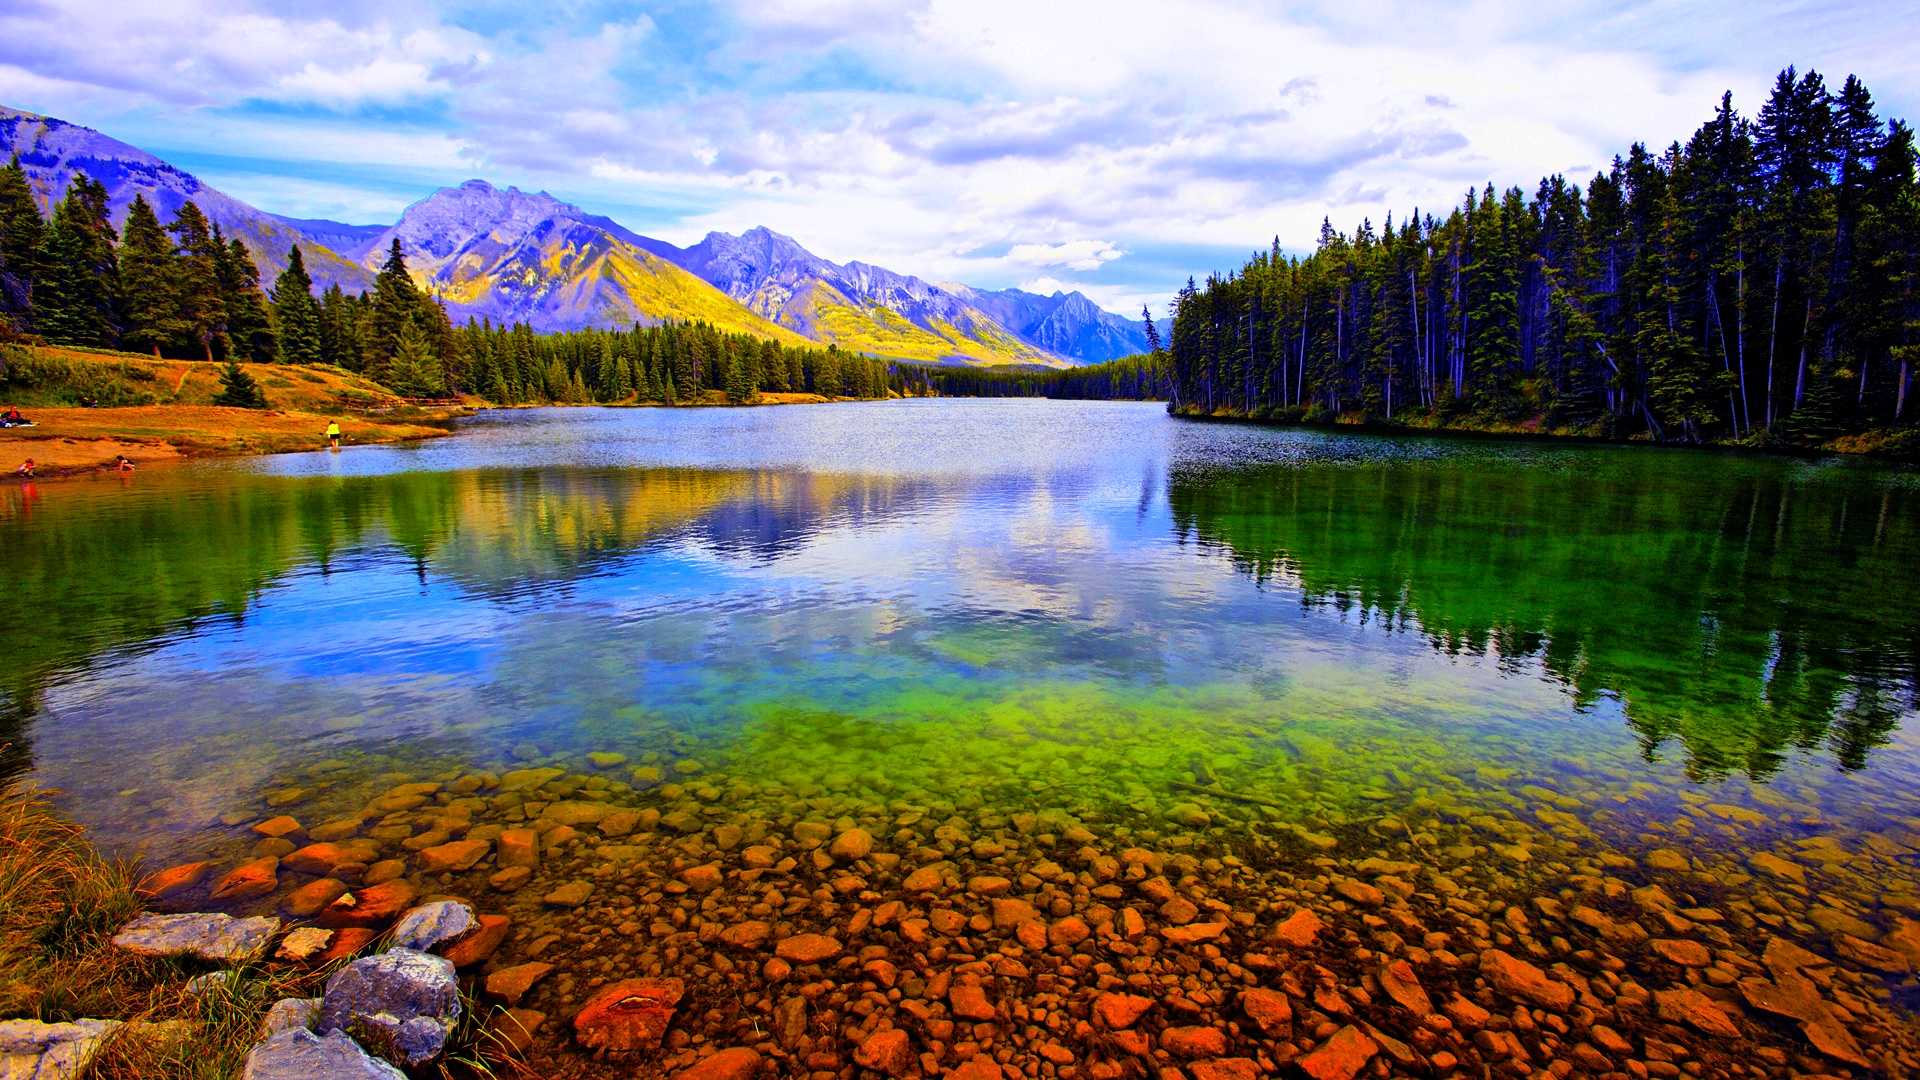 parque nacional banff fondo de pantalla   ForWallpapercom 1920x1080